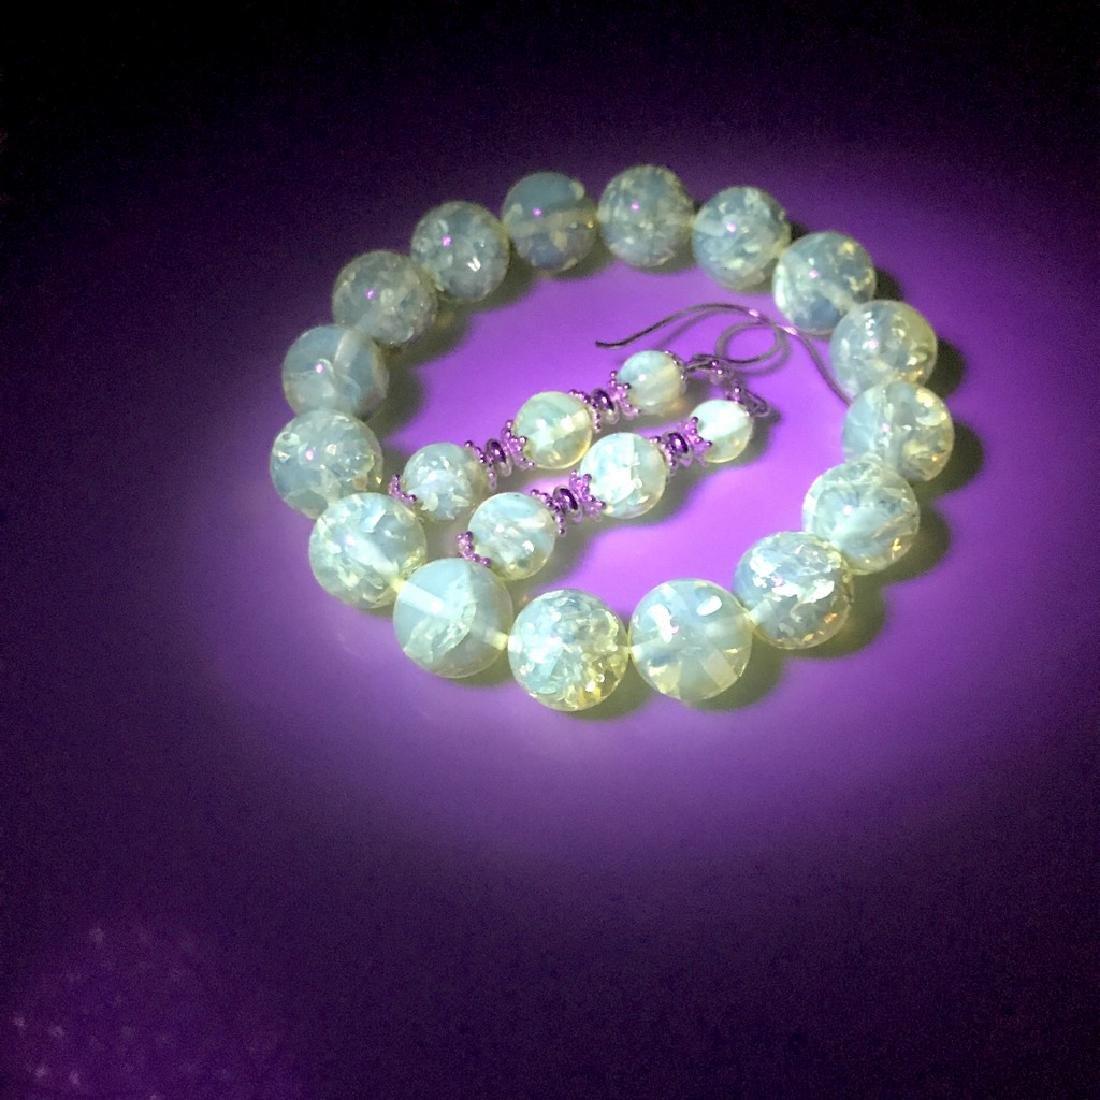 Baltic amber & sterling silver bracelet & earrings 19 - 10